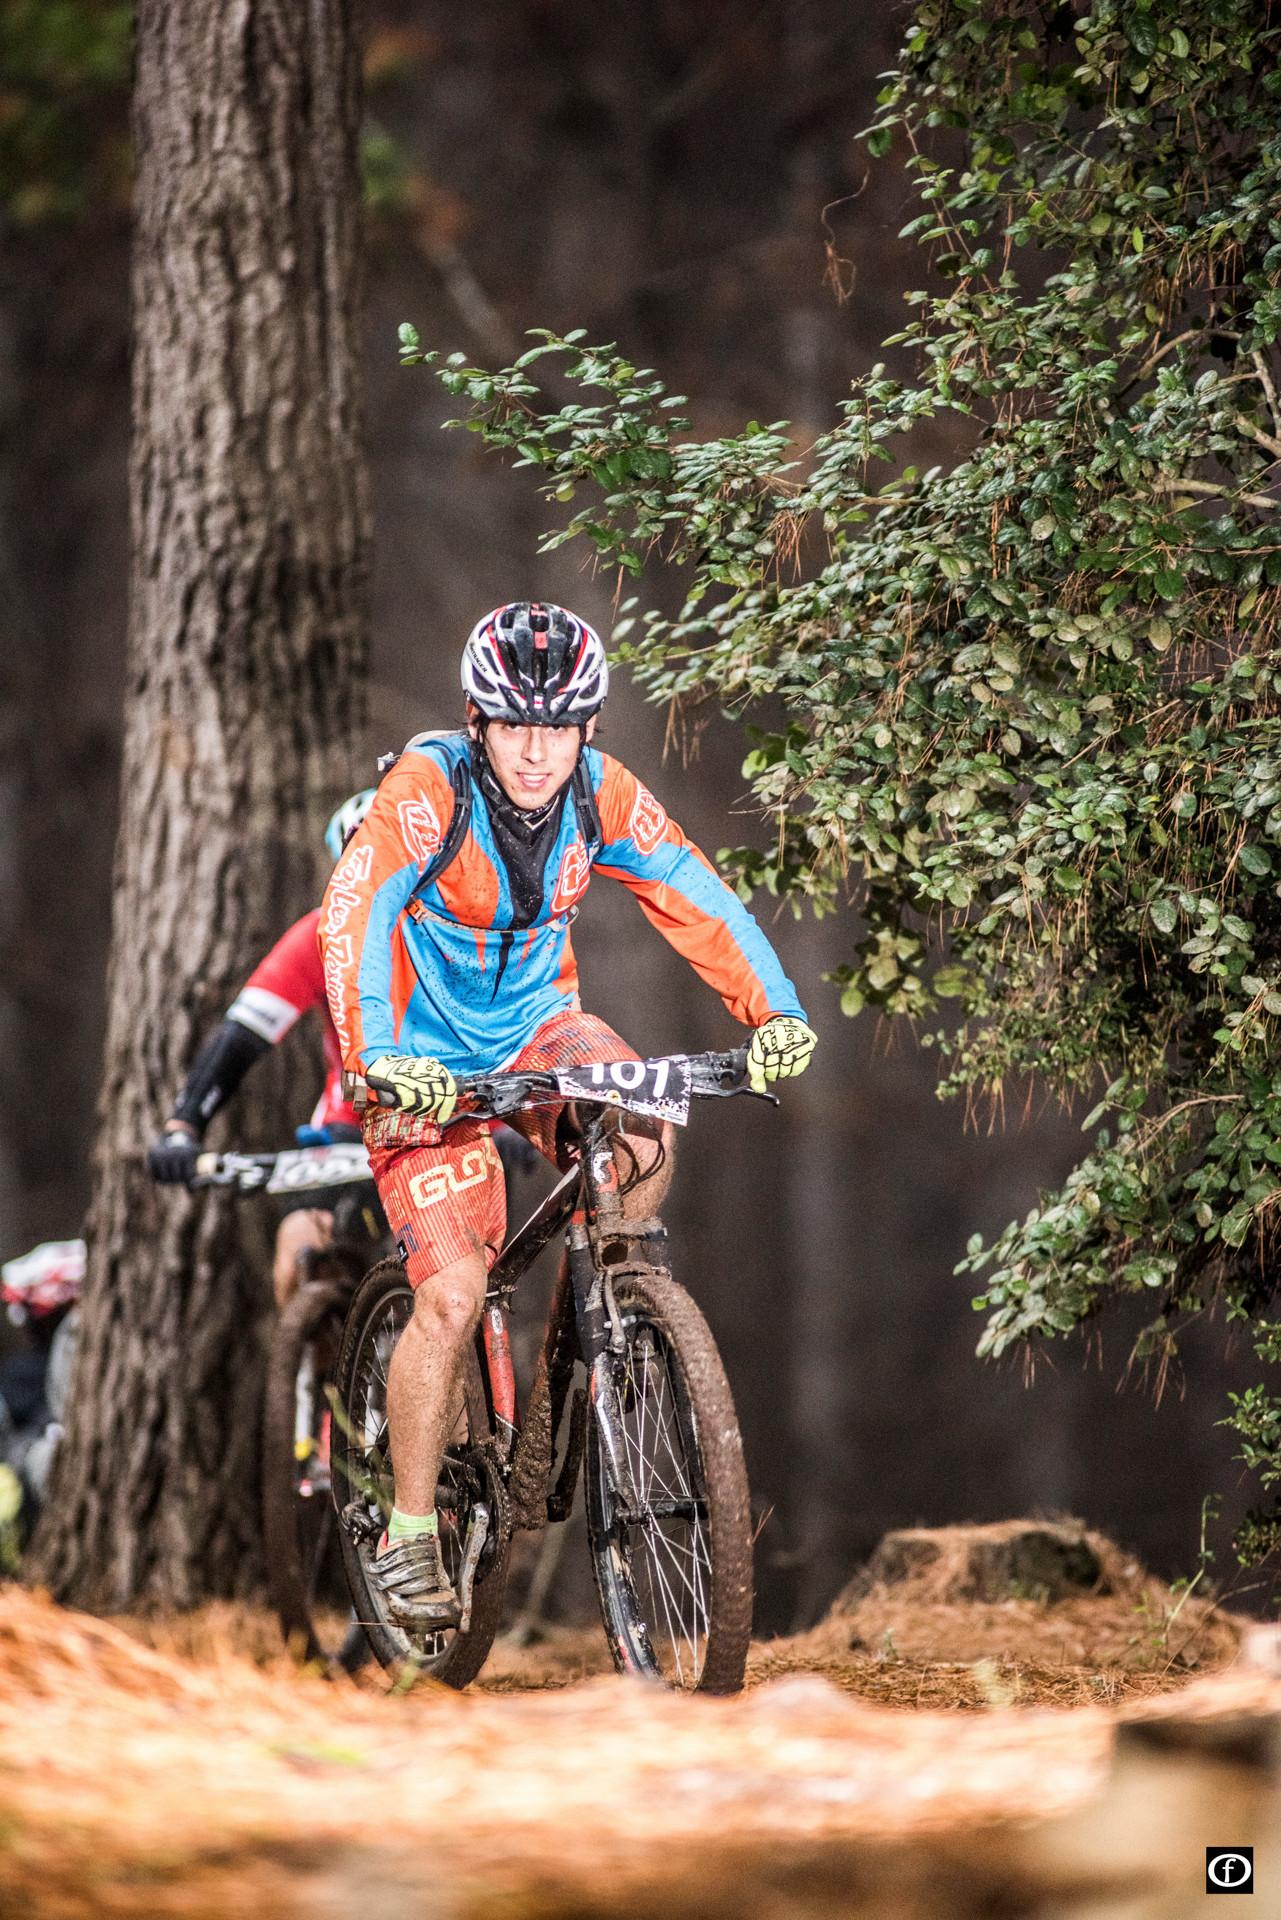 2015-05-17-Ciclismo Enduro-49.jpg